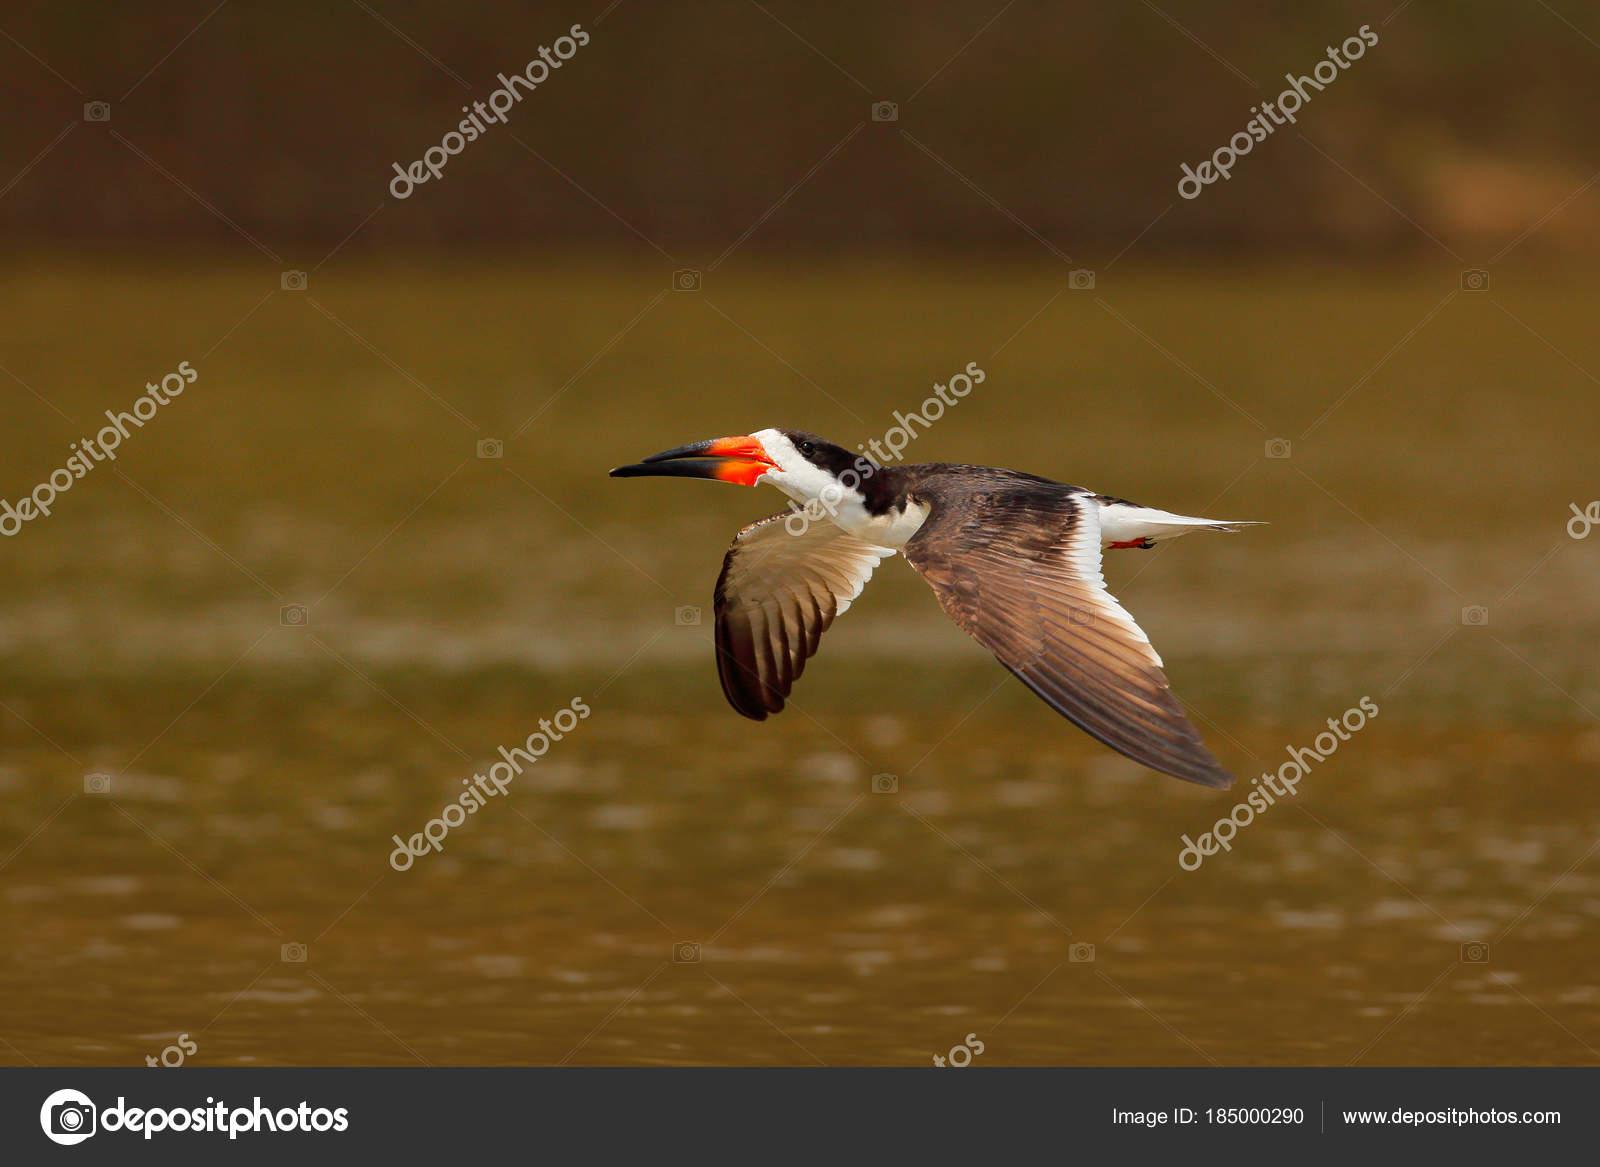 Black Skimmer Fly River Sand Beach Rio Negro Pantanal Brazil